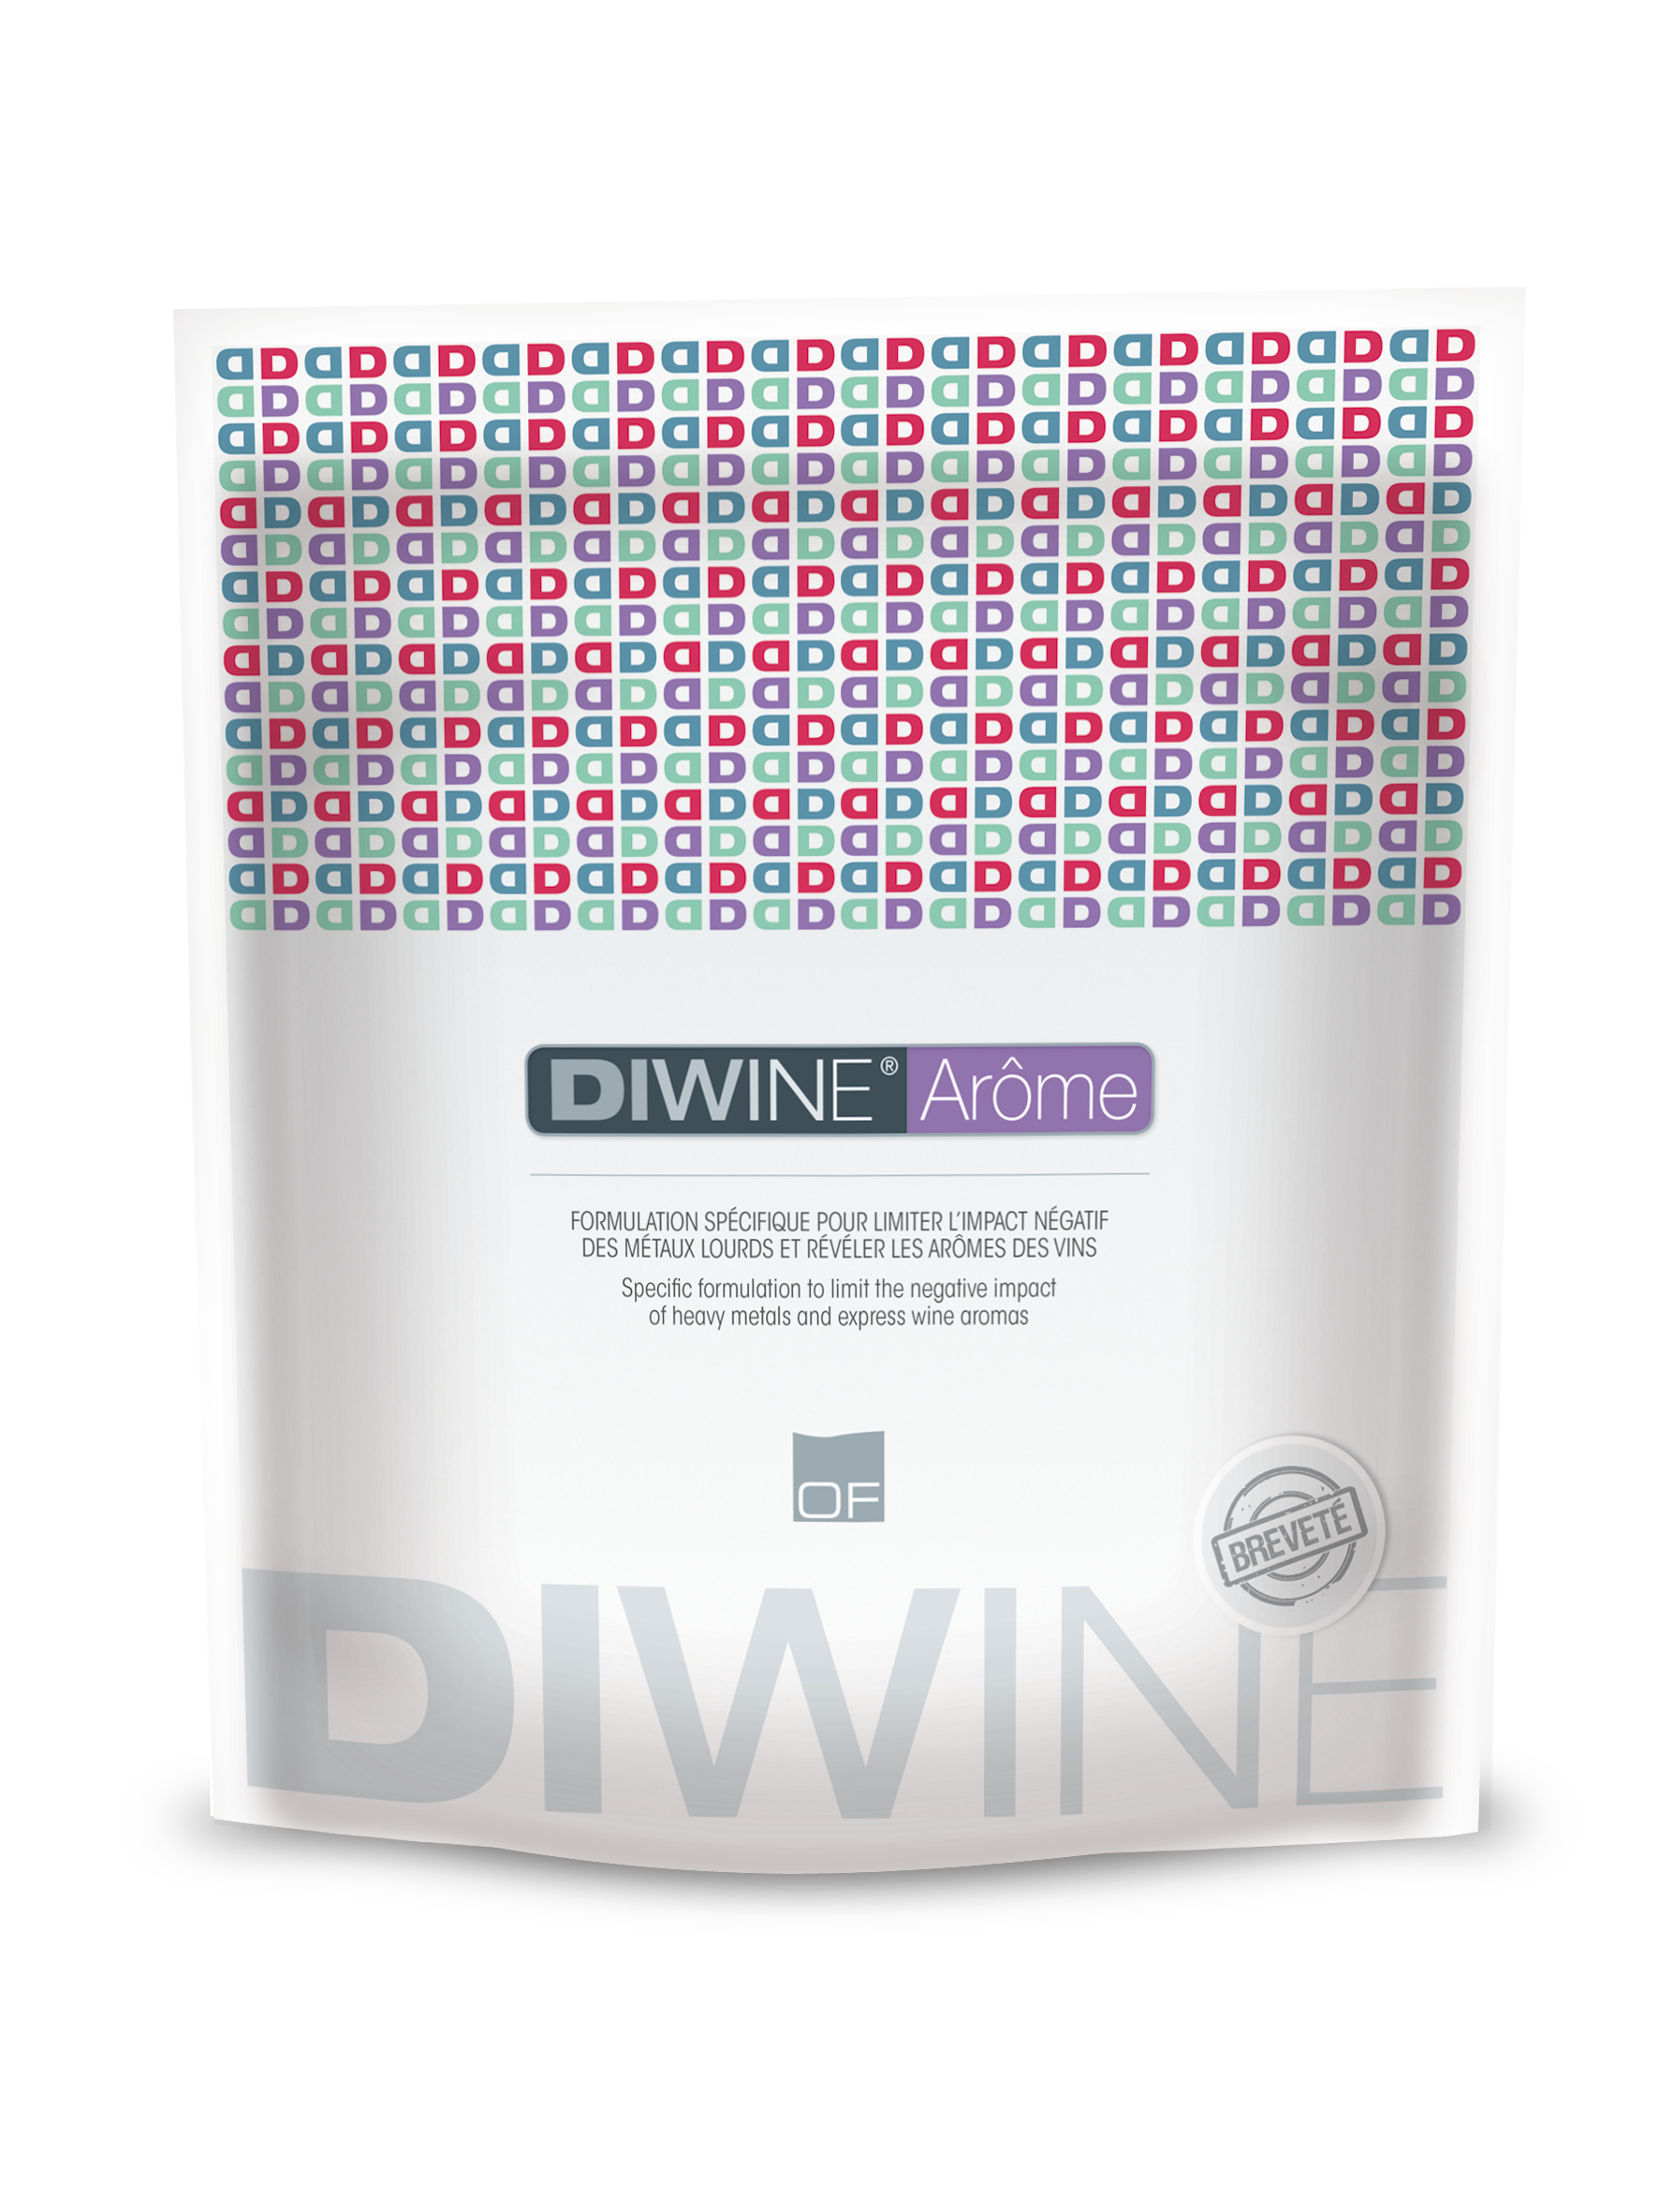 DIWINE-AROME-mockup-NEW2016